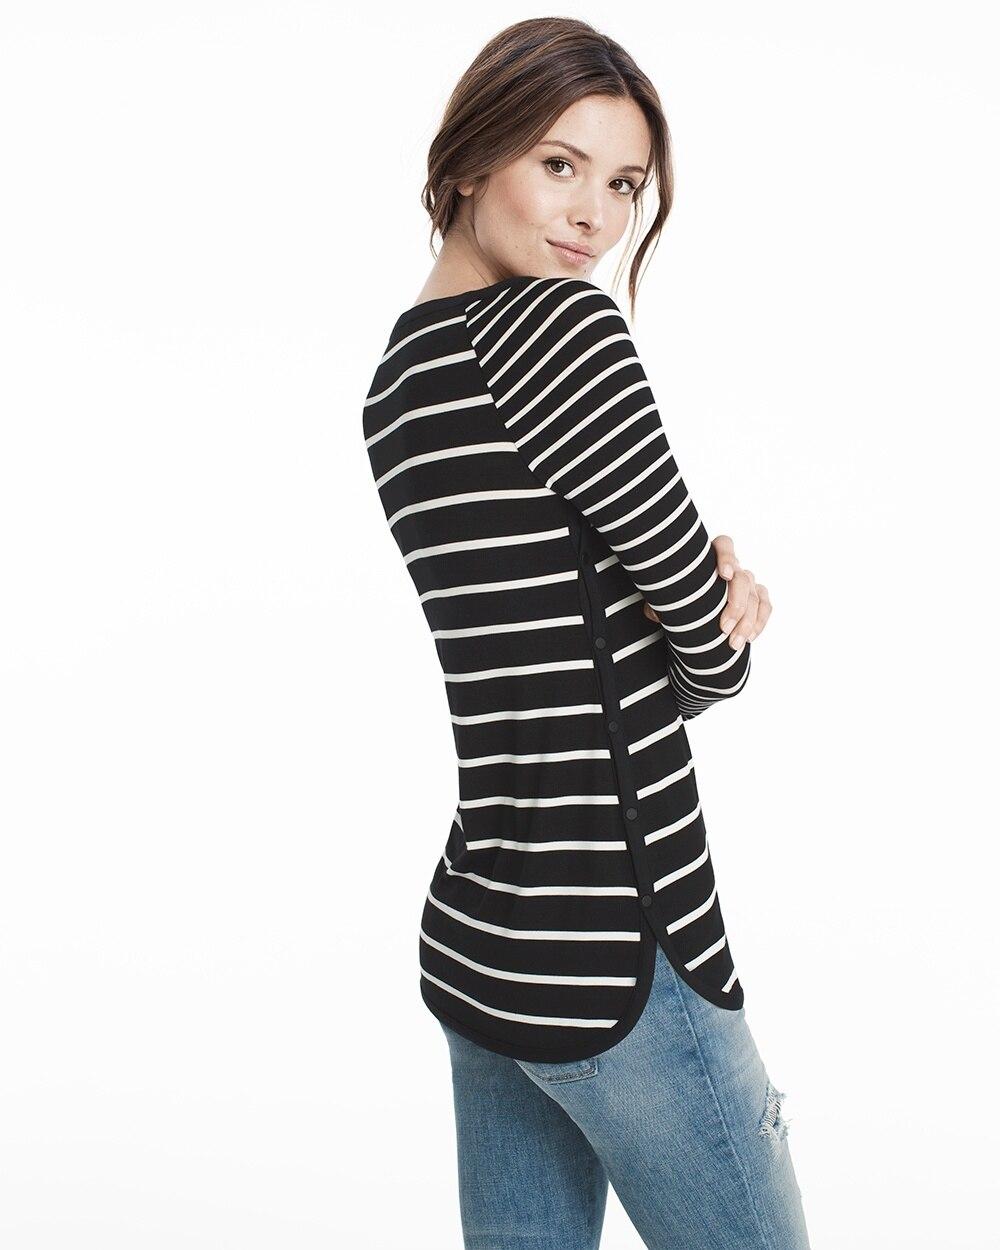 Black & White Long-Sleeve Stripe Tunic - WHBM